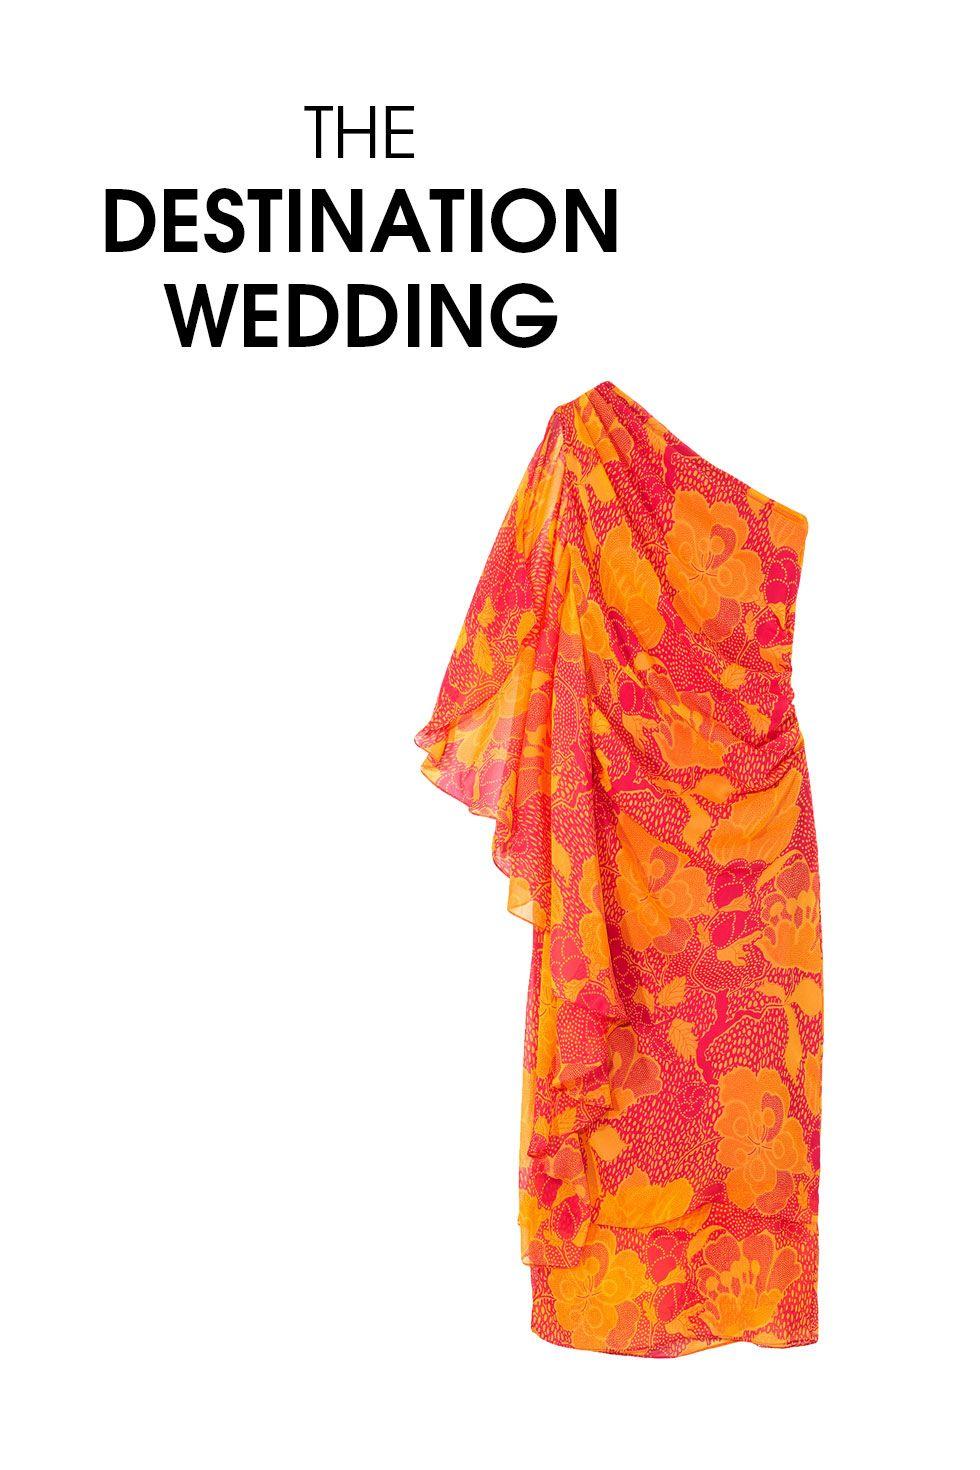 "<p>Diane von Furstenberg 'Nori' Drape One-Shoulder Silk Dress, $648&#x3B; <a href=""http://shop.nordstrom.com/s/diane-von-furstenberg-nori-drape-one-shoulder-silk-dress/4301601?&cm_mmc=Mindshare_Nordstrom-_-JuneWAP-_-Hearst-_-proactive"" target=""_blank"">nordstrom.com</a></p>"